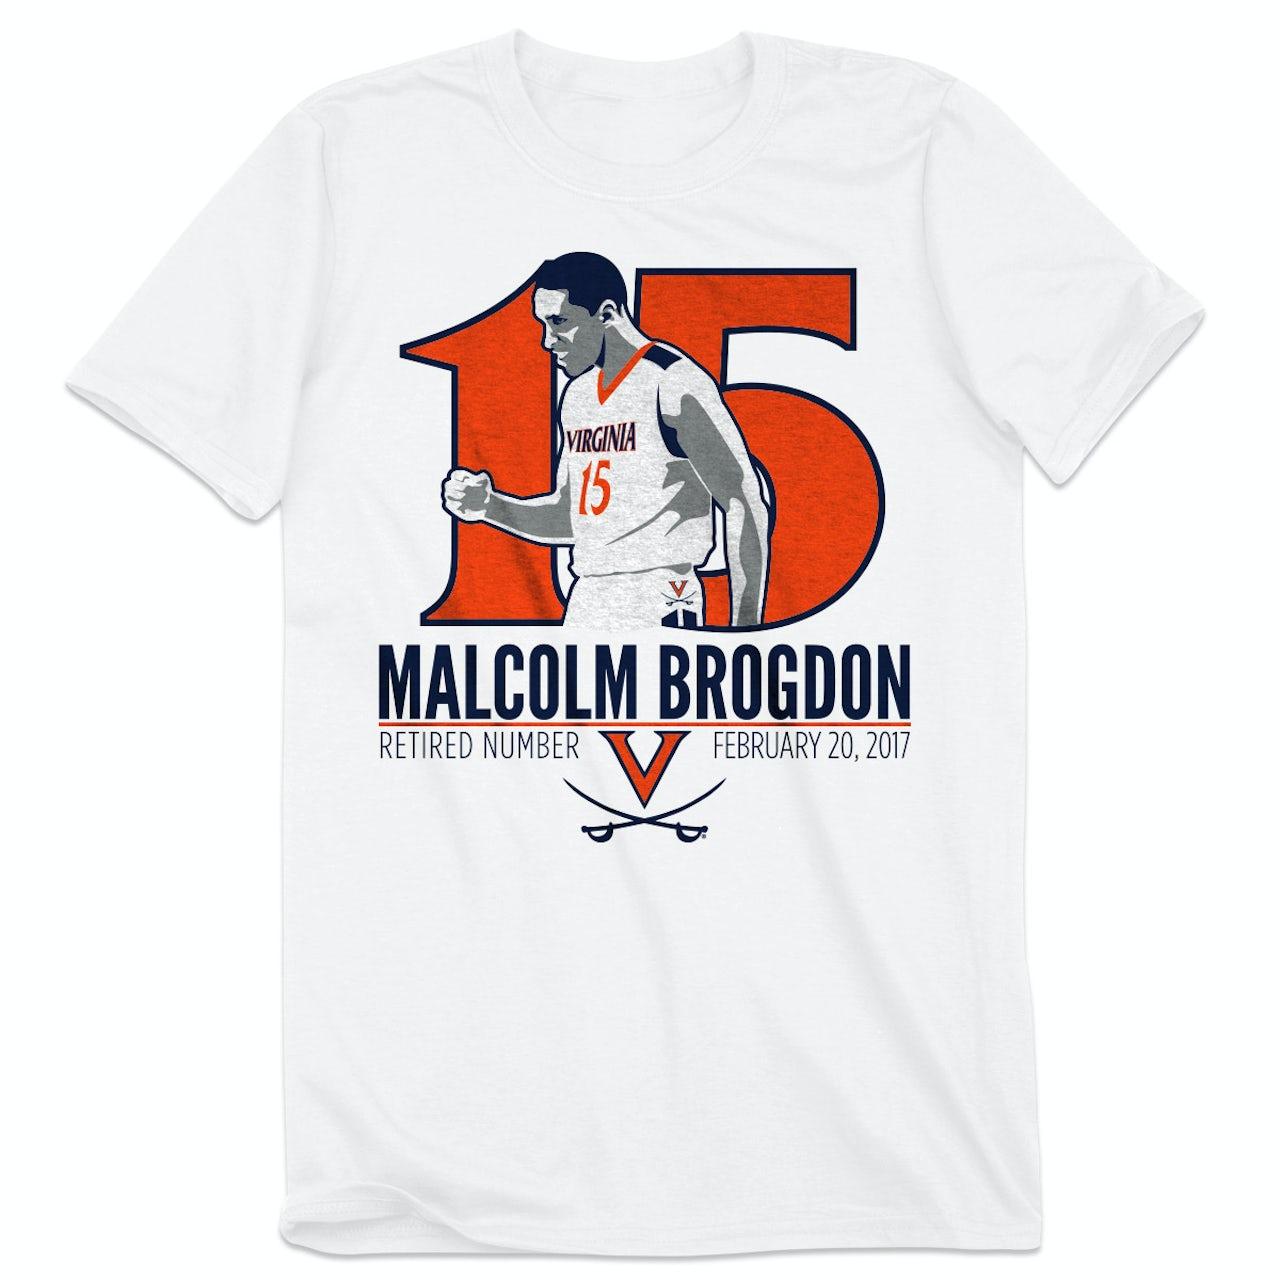 finest selection 5939b 1ab58 UVA Athletics Malcolm Brogdon Retired Number T-Shirt